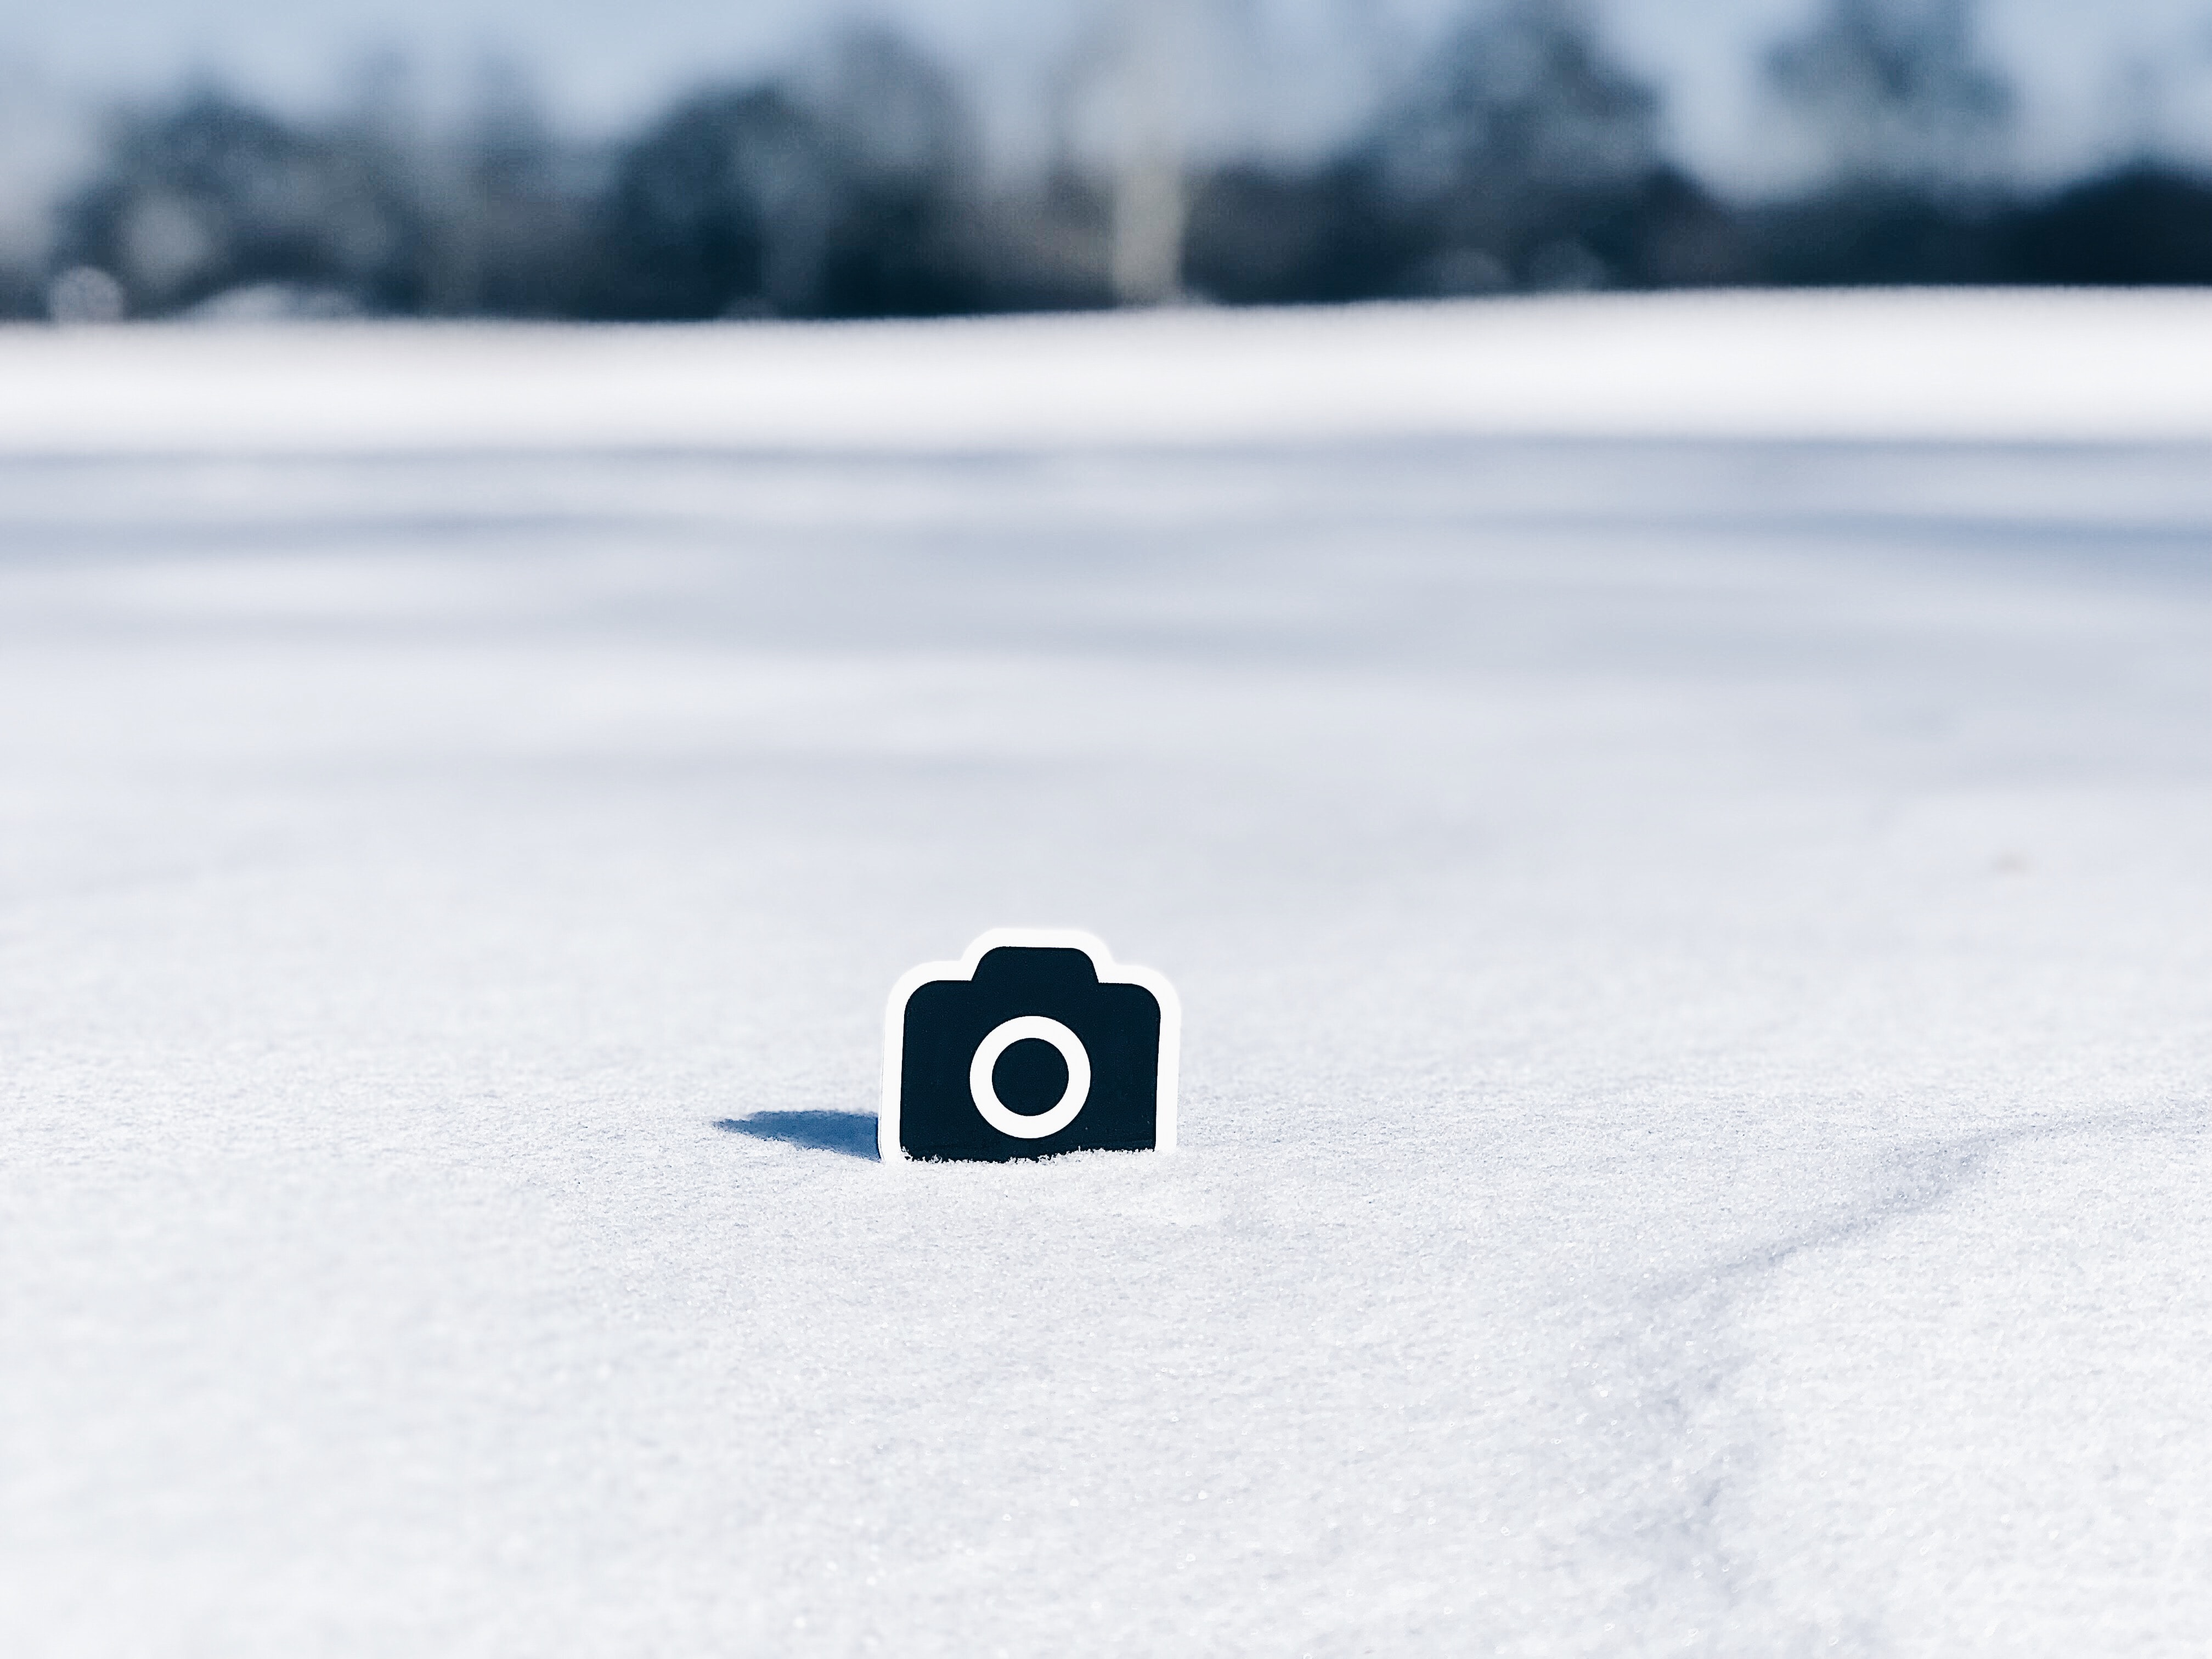 camera sticker on snow land